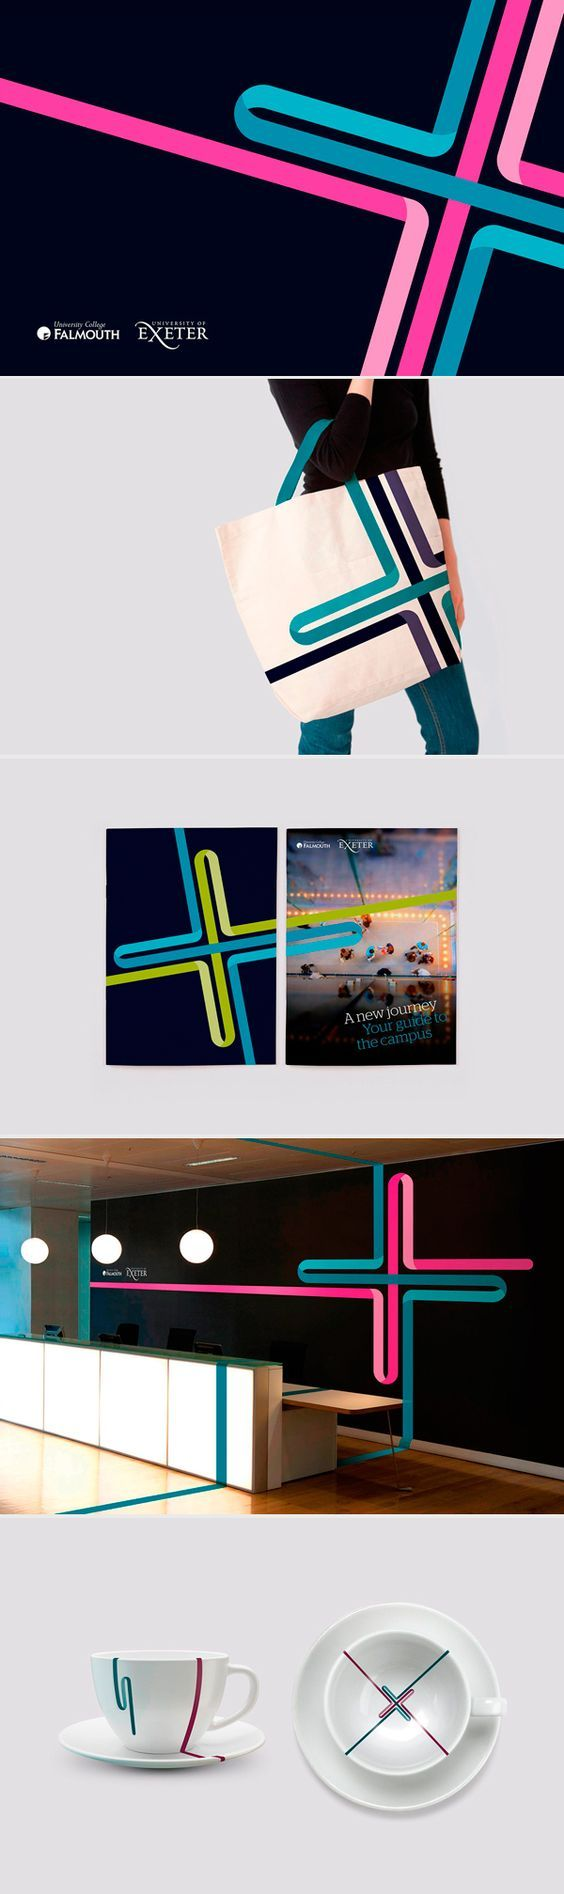 Falmouth Exeter Plus Branding   Fivestar Branding – Design and Branding Agency & Inspiration Gallery   Professional Logo and Website Design